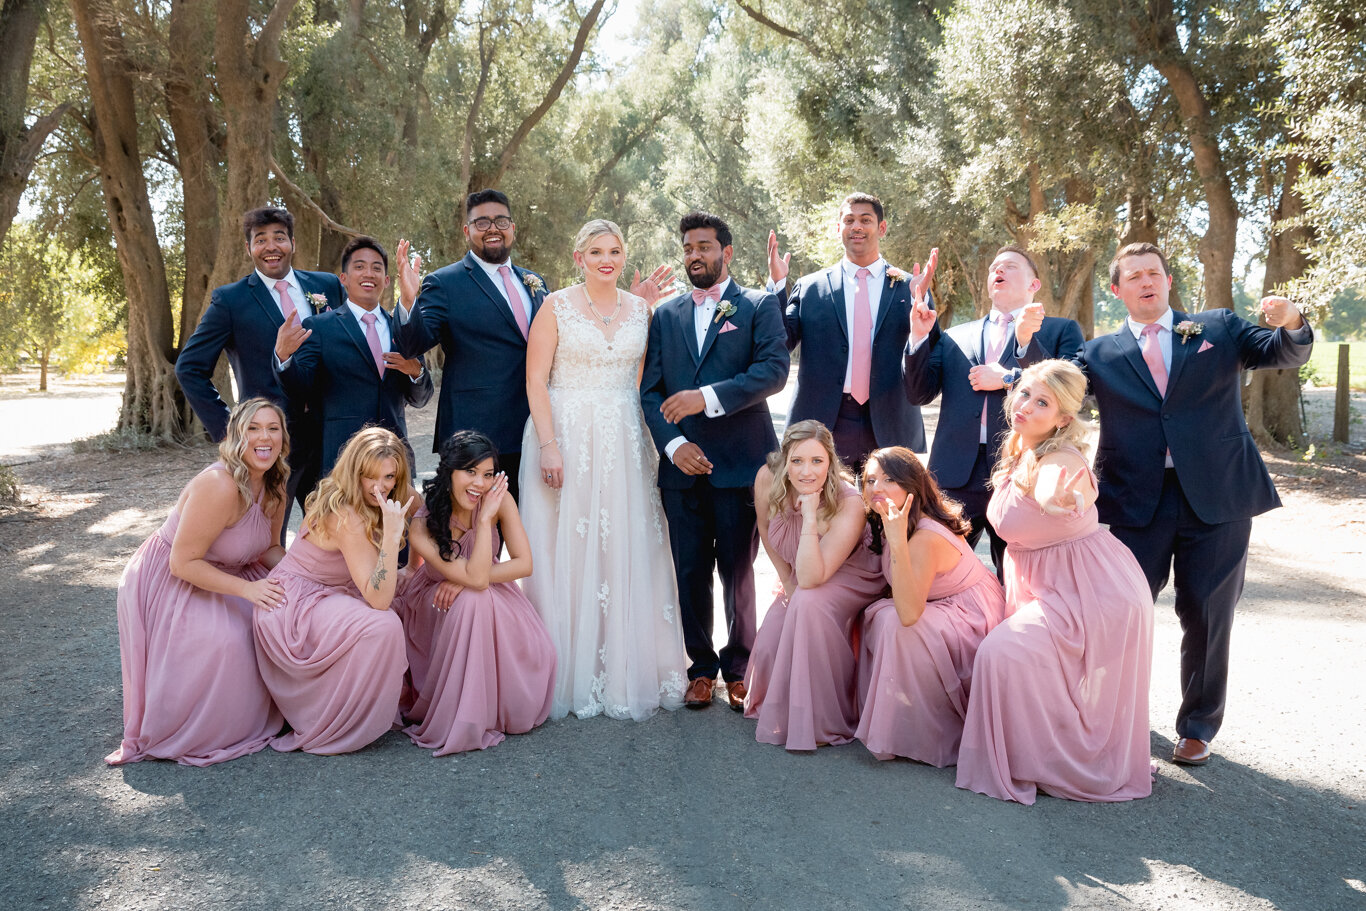 2019.08.24_Emily-Ashir-Wedding-at-the-Maples-5452.jpg